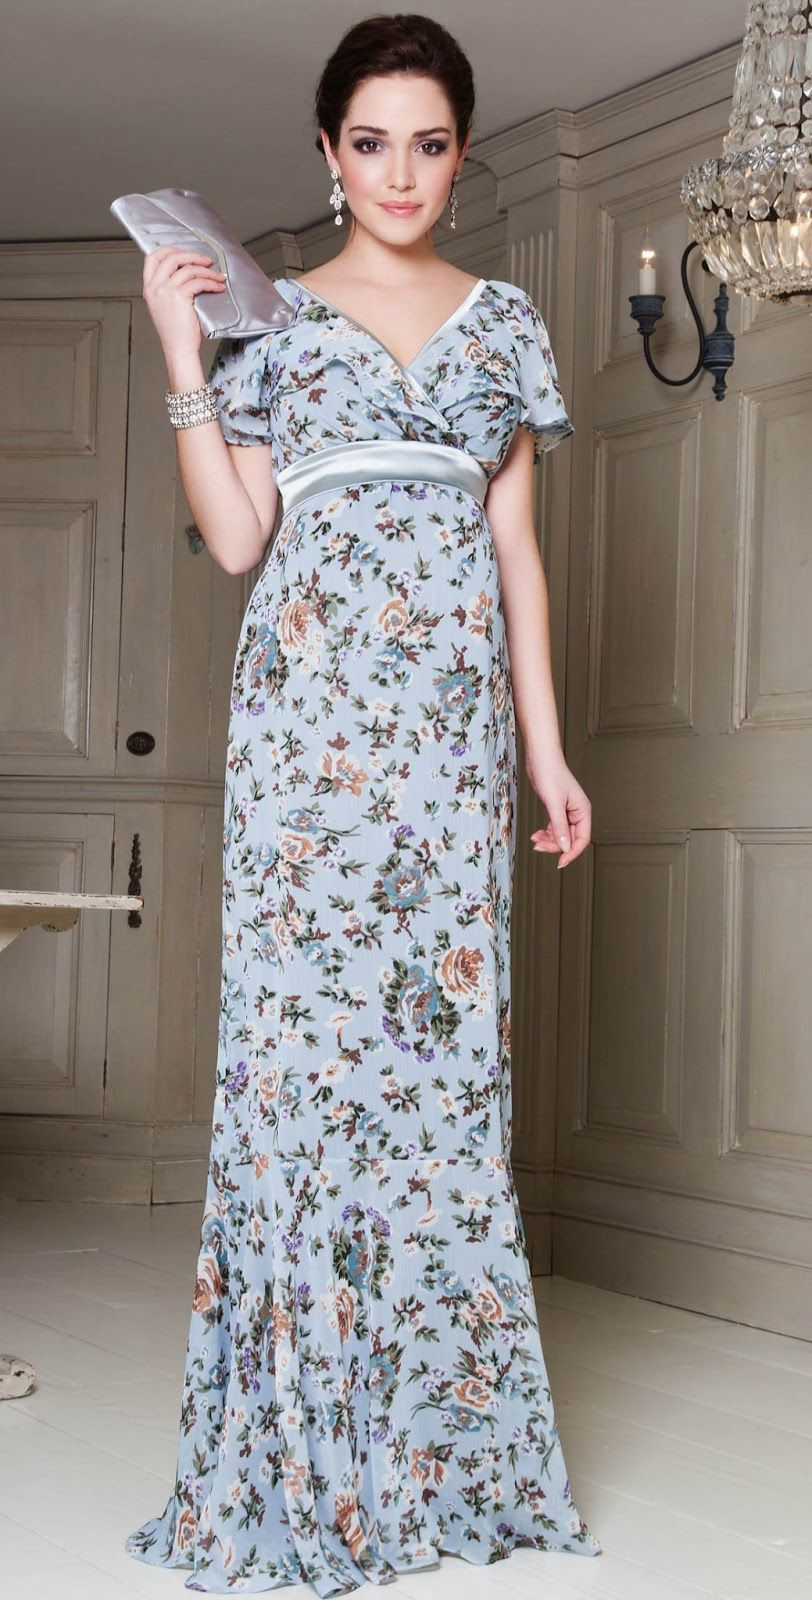 Summer Pregnancy Dress | Screenfonds | Fashion Maternity Style ...